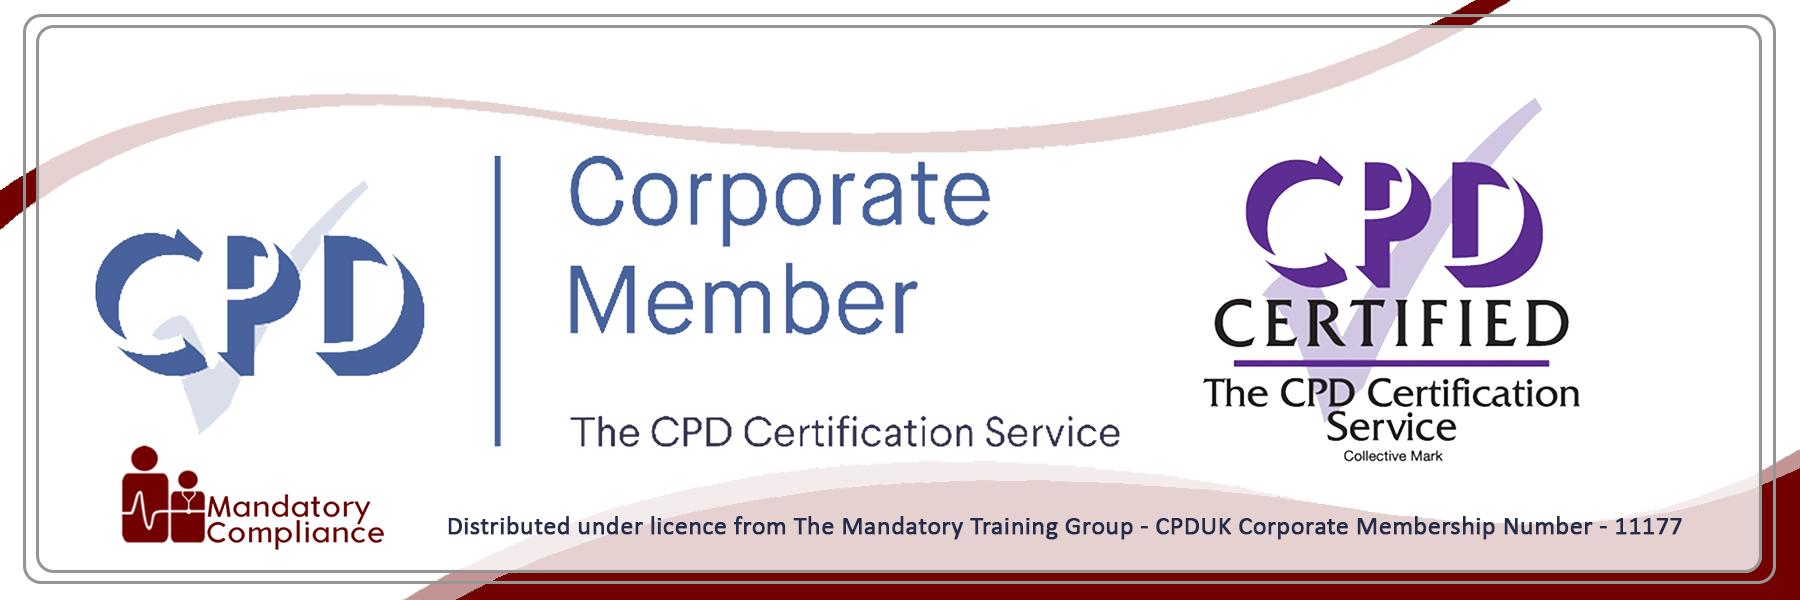 Cerebral Palsy Awareness - Level 2 - Online Training Course - CPDUK Accredited - Mandatory Compliance UK -